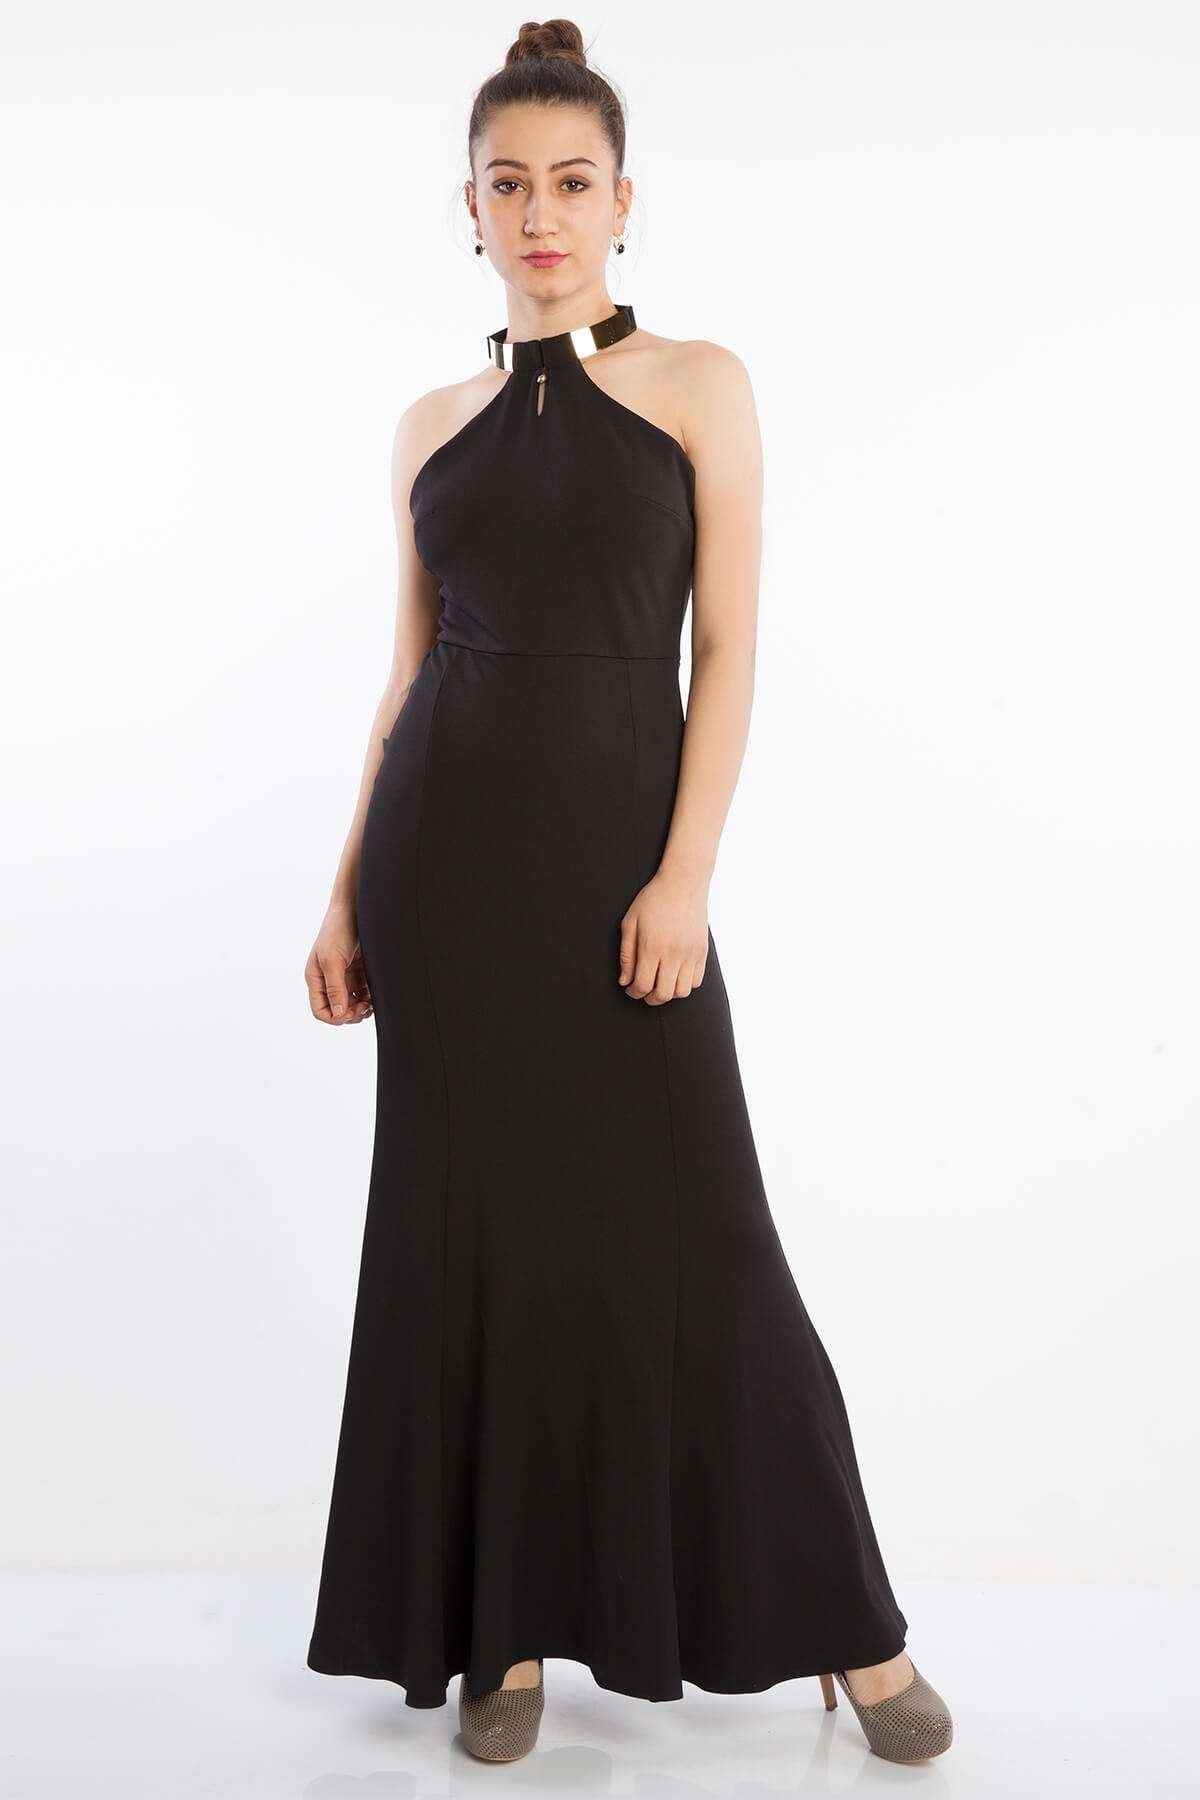 Kolye Yaka Dekolte Uzun Elbise Siyah